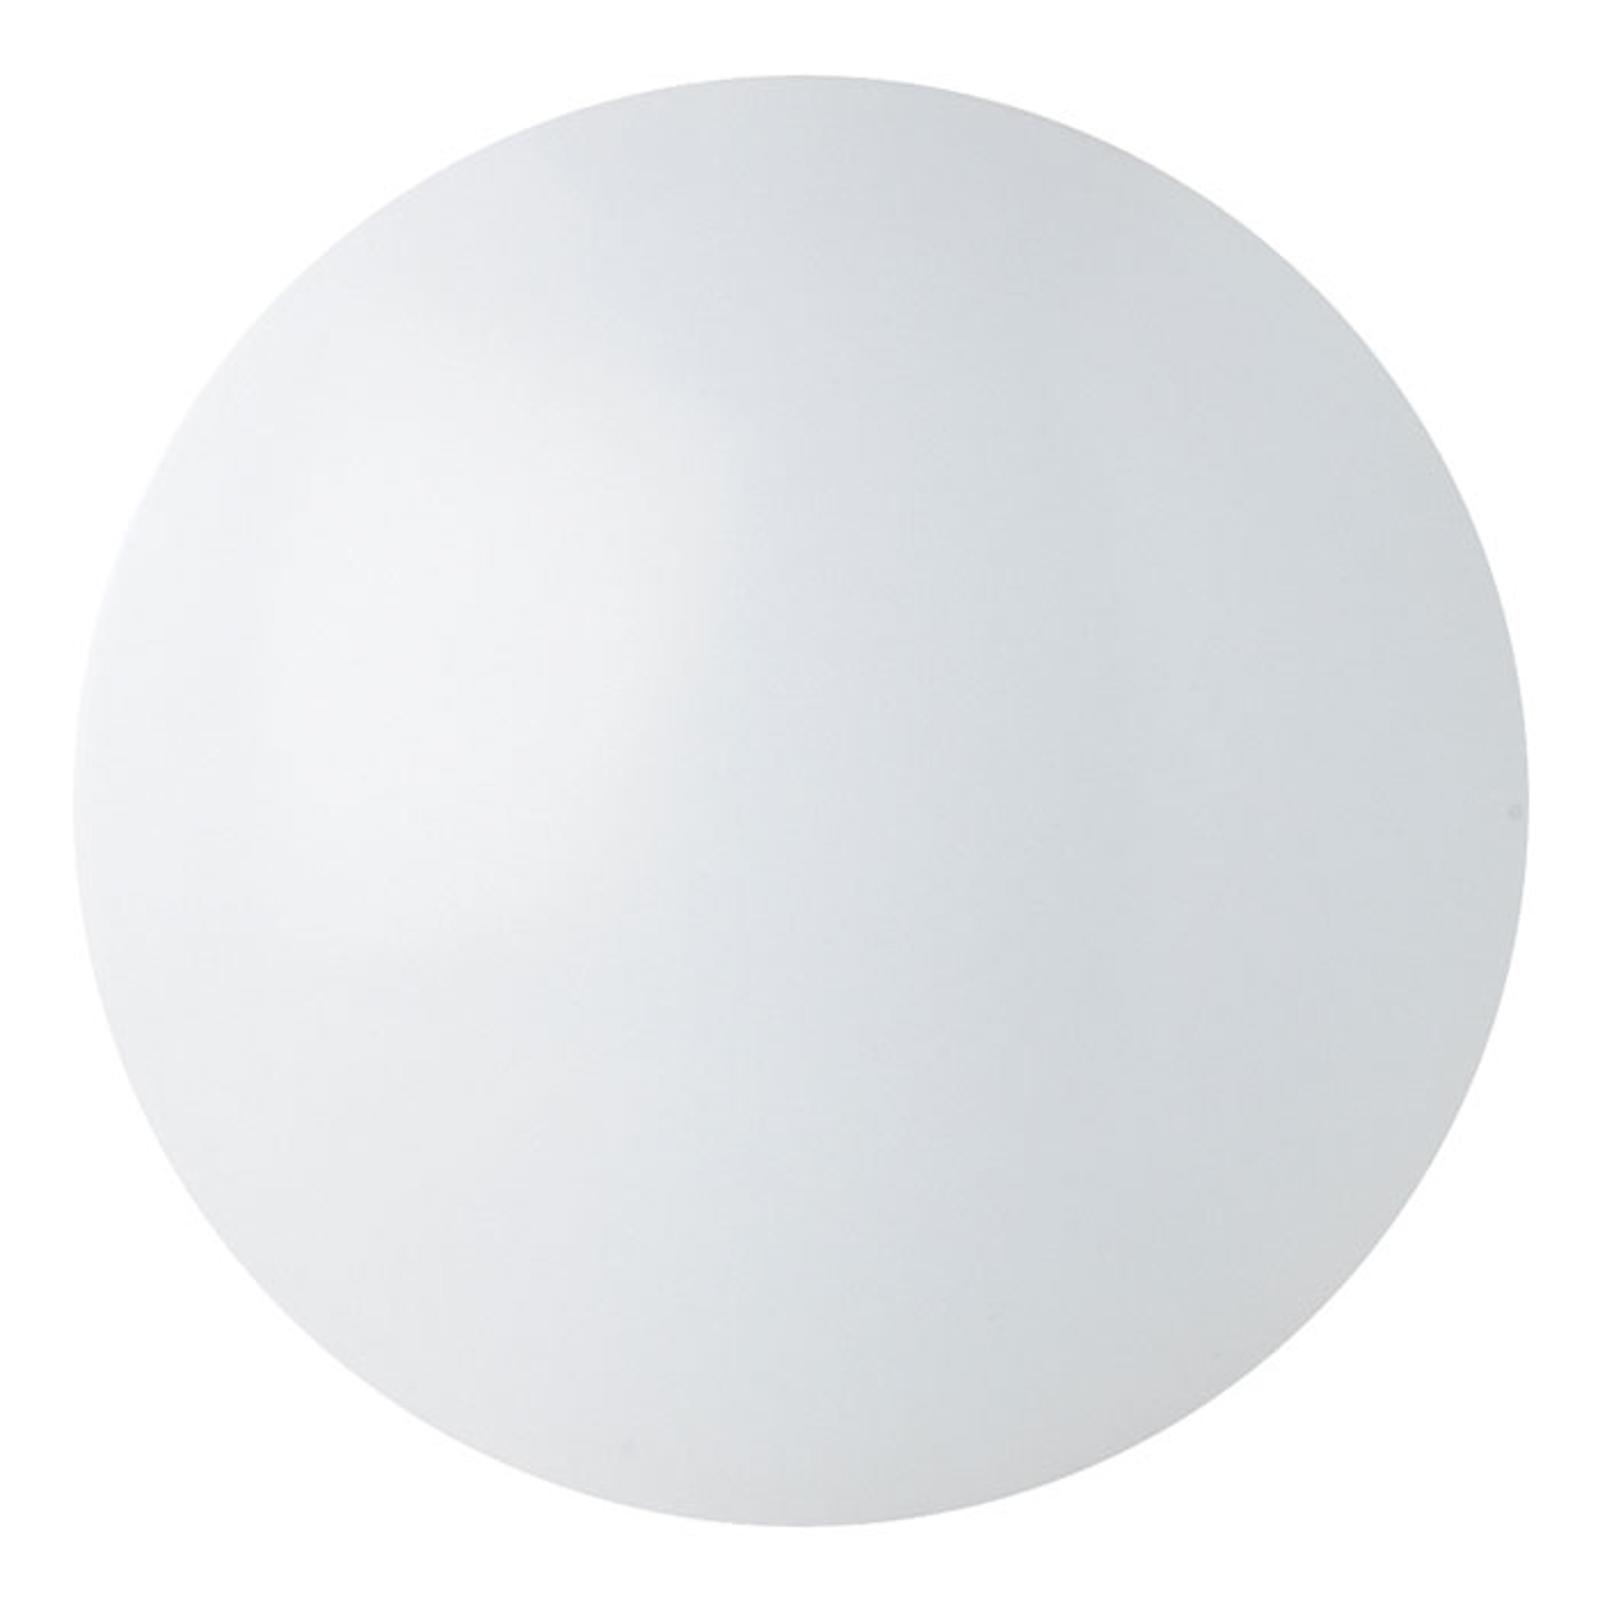 Renzo - ronde led-plafondlamp IP44, universeelwit